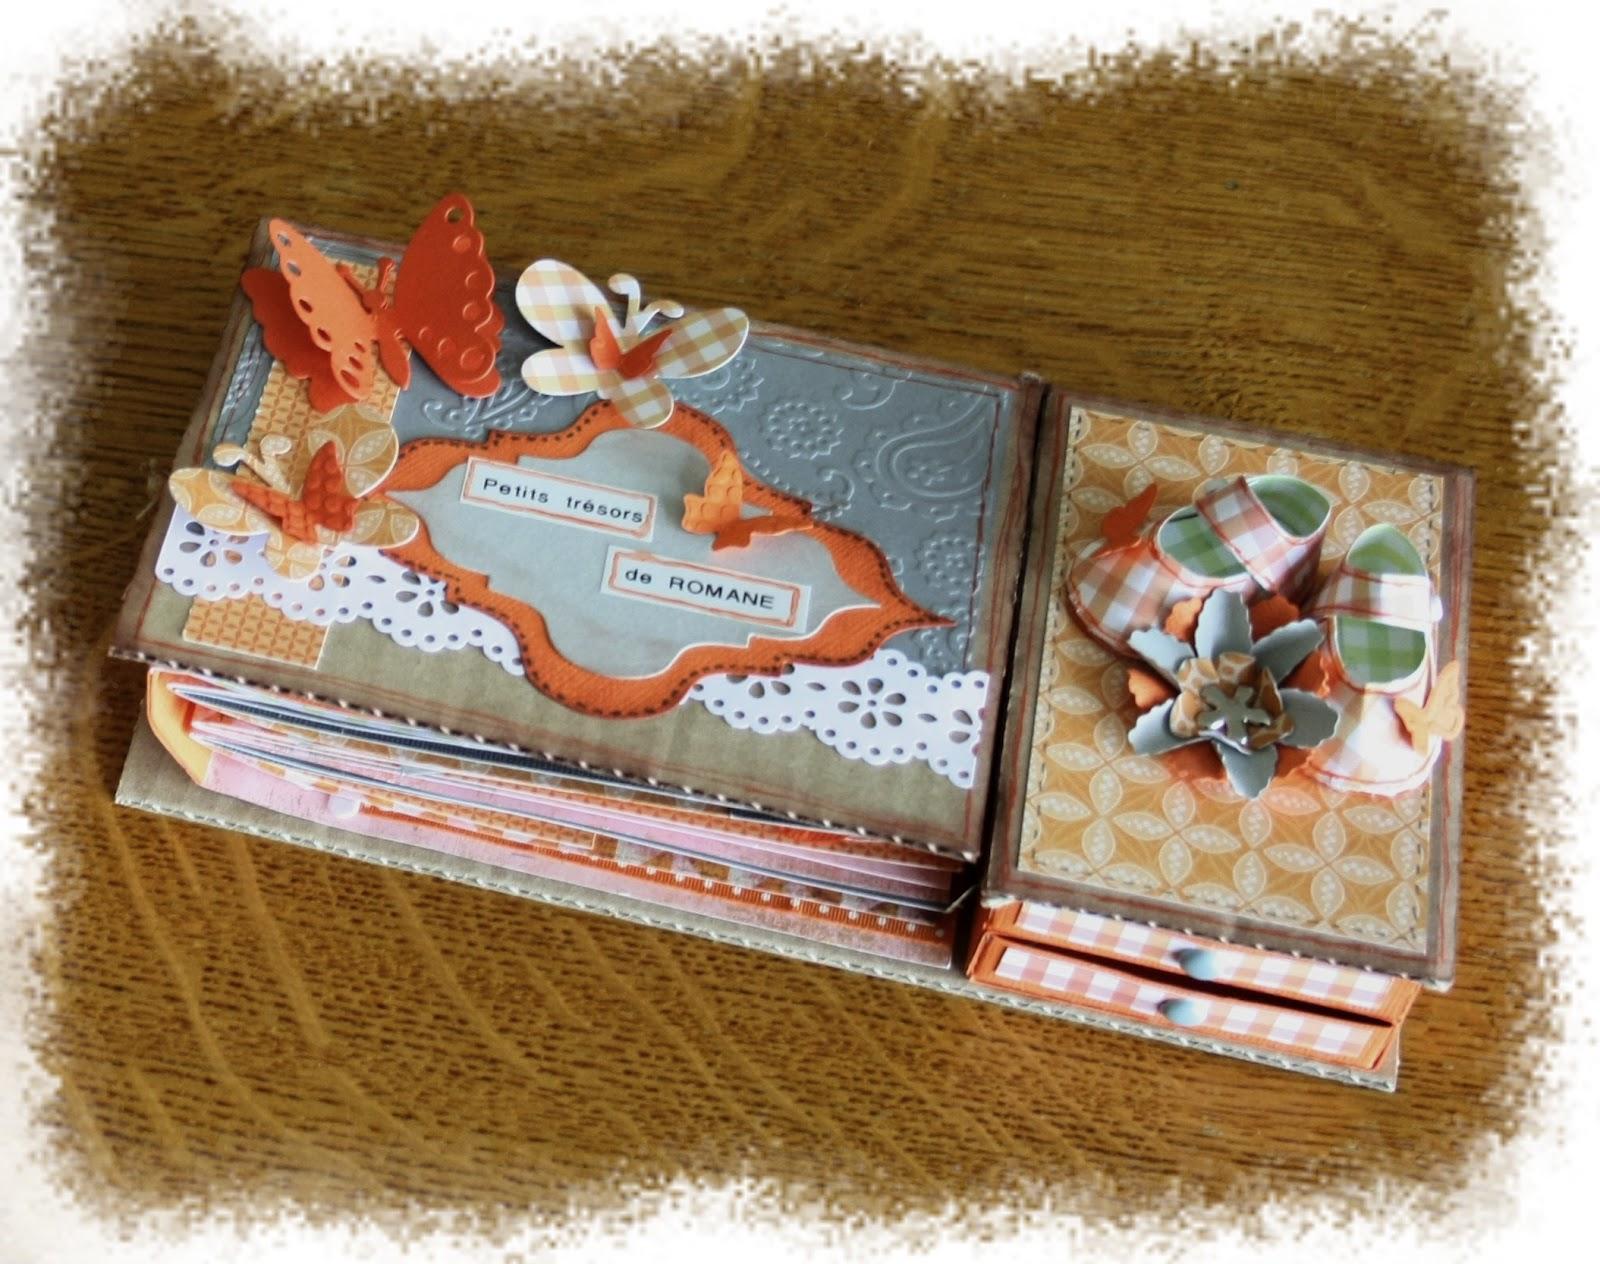 the nini 39 s scrap mini album et sa boite souvenir de naissance. Black Bedroom Furniture Sets. Home Design Ideas